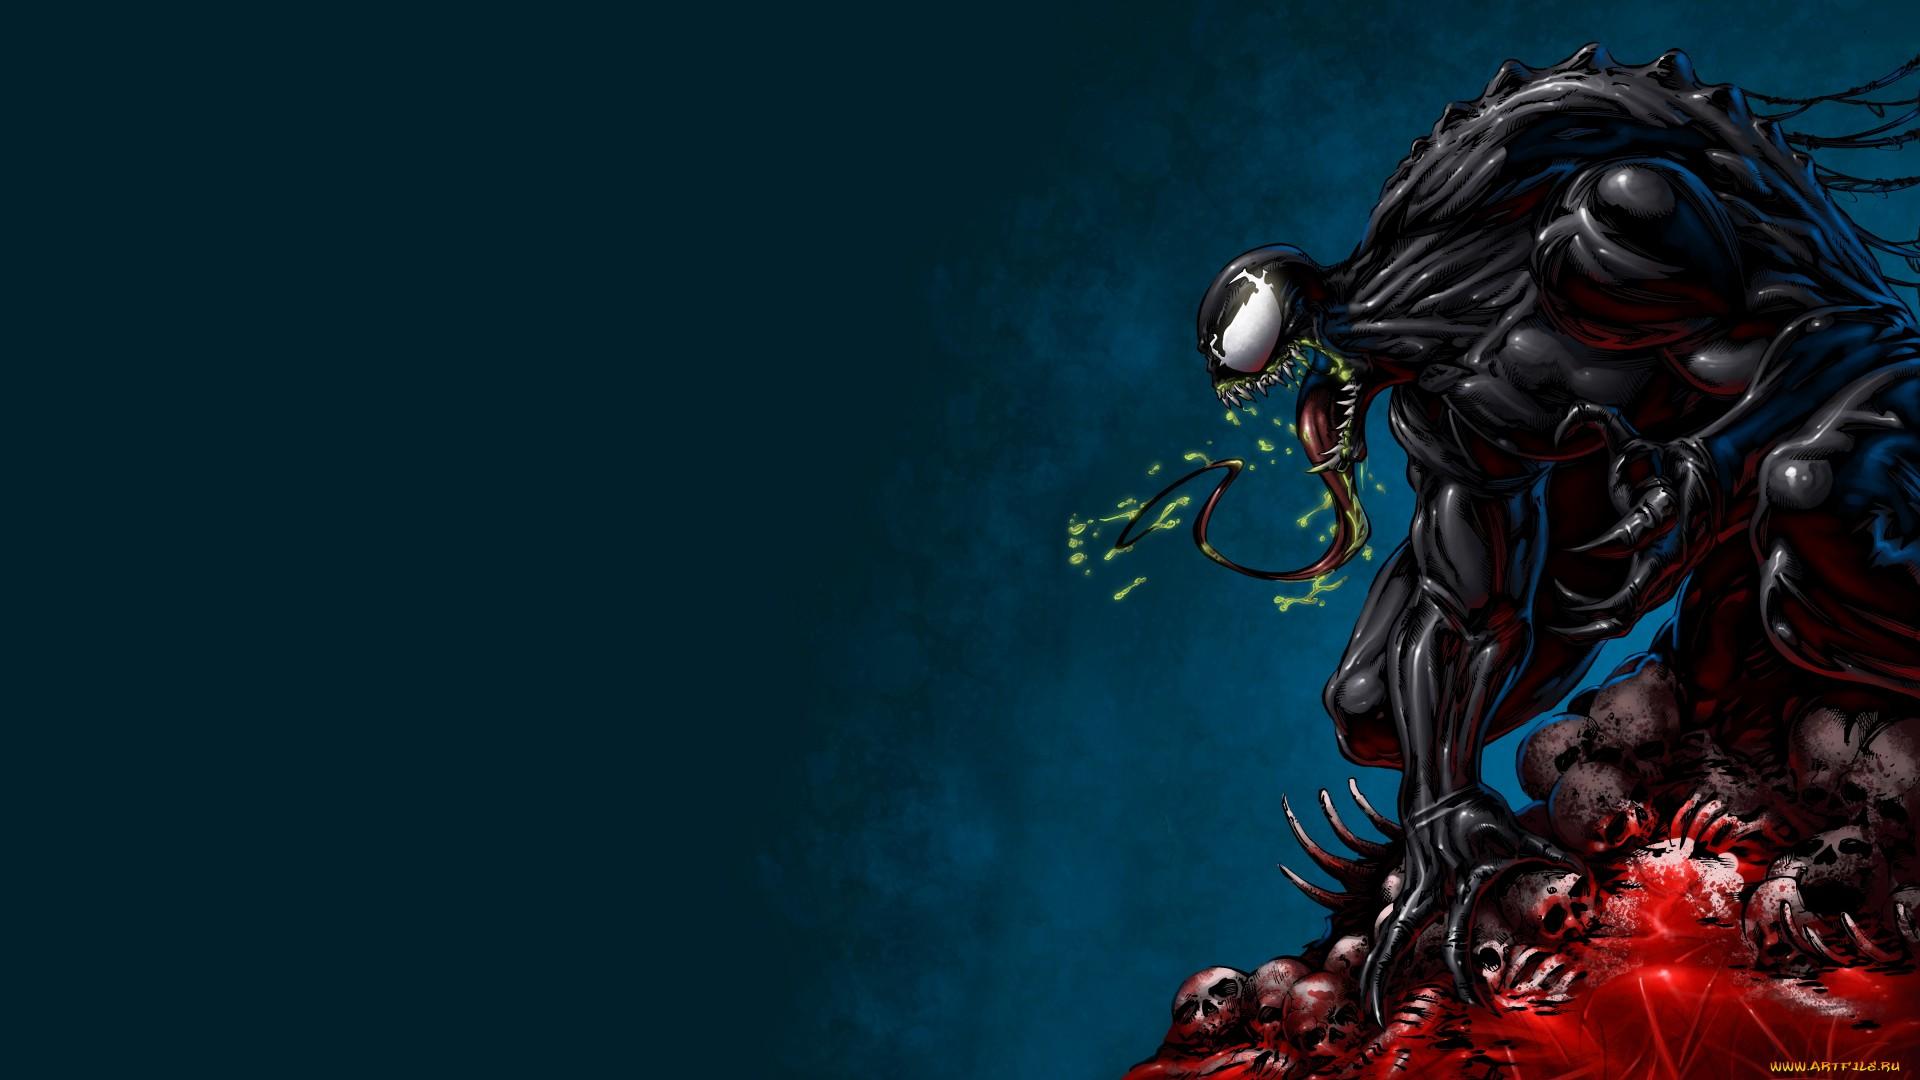 Venom Hd Wallpaper Background Image 1920x1080 Id 492544